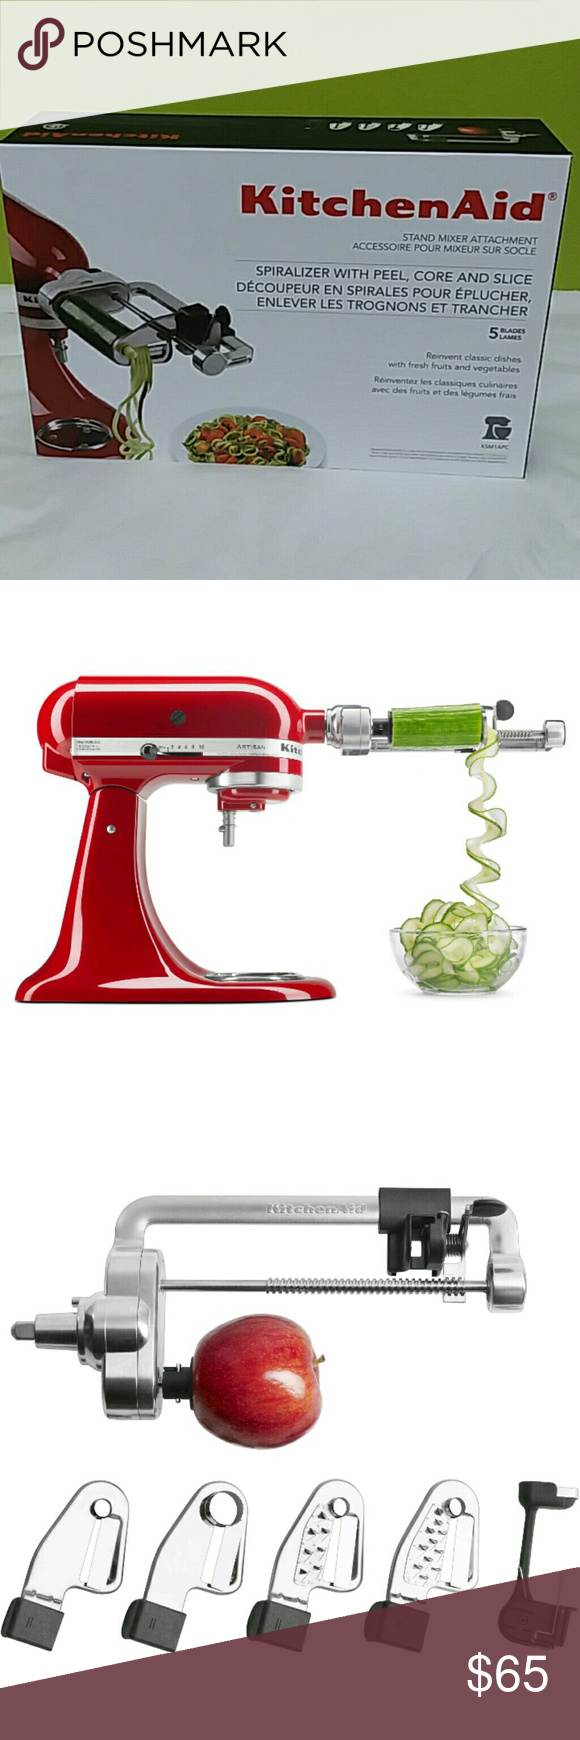 Kitchenaid Spiralizer Attachment For Stand Mixer Brand New